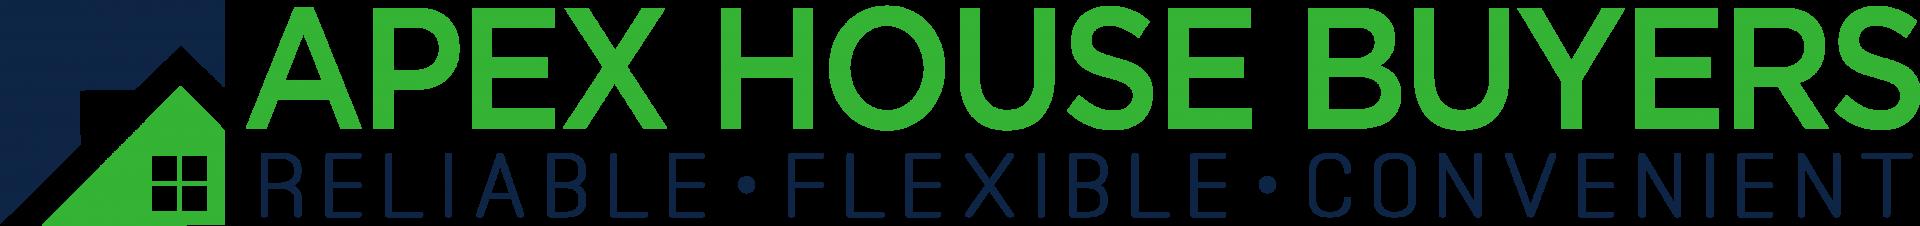 Apex House Buyers  logo